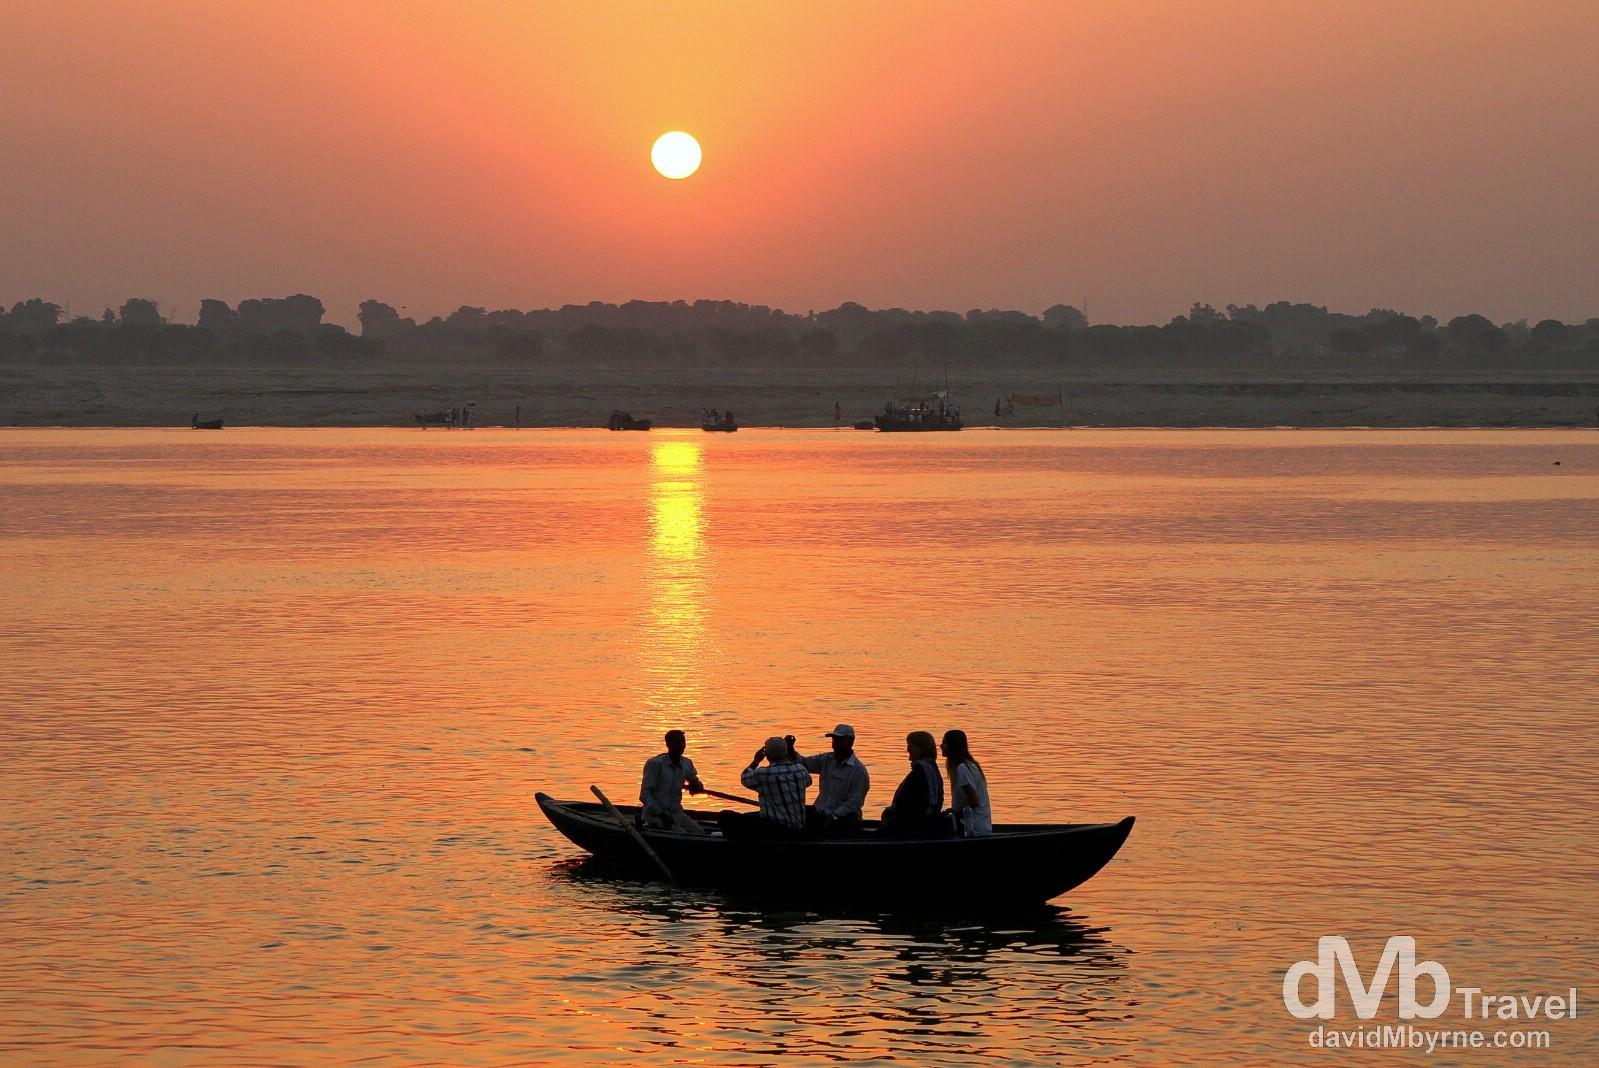 A tourist boat on the Ganges River at sunrise. Varanasi, Uttar Pradesh, India. October 13th 2012.